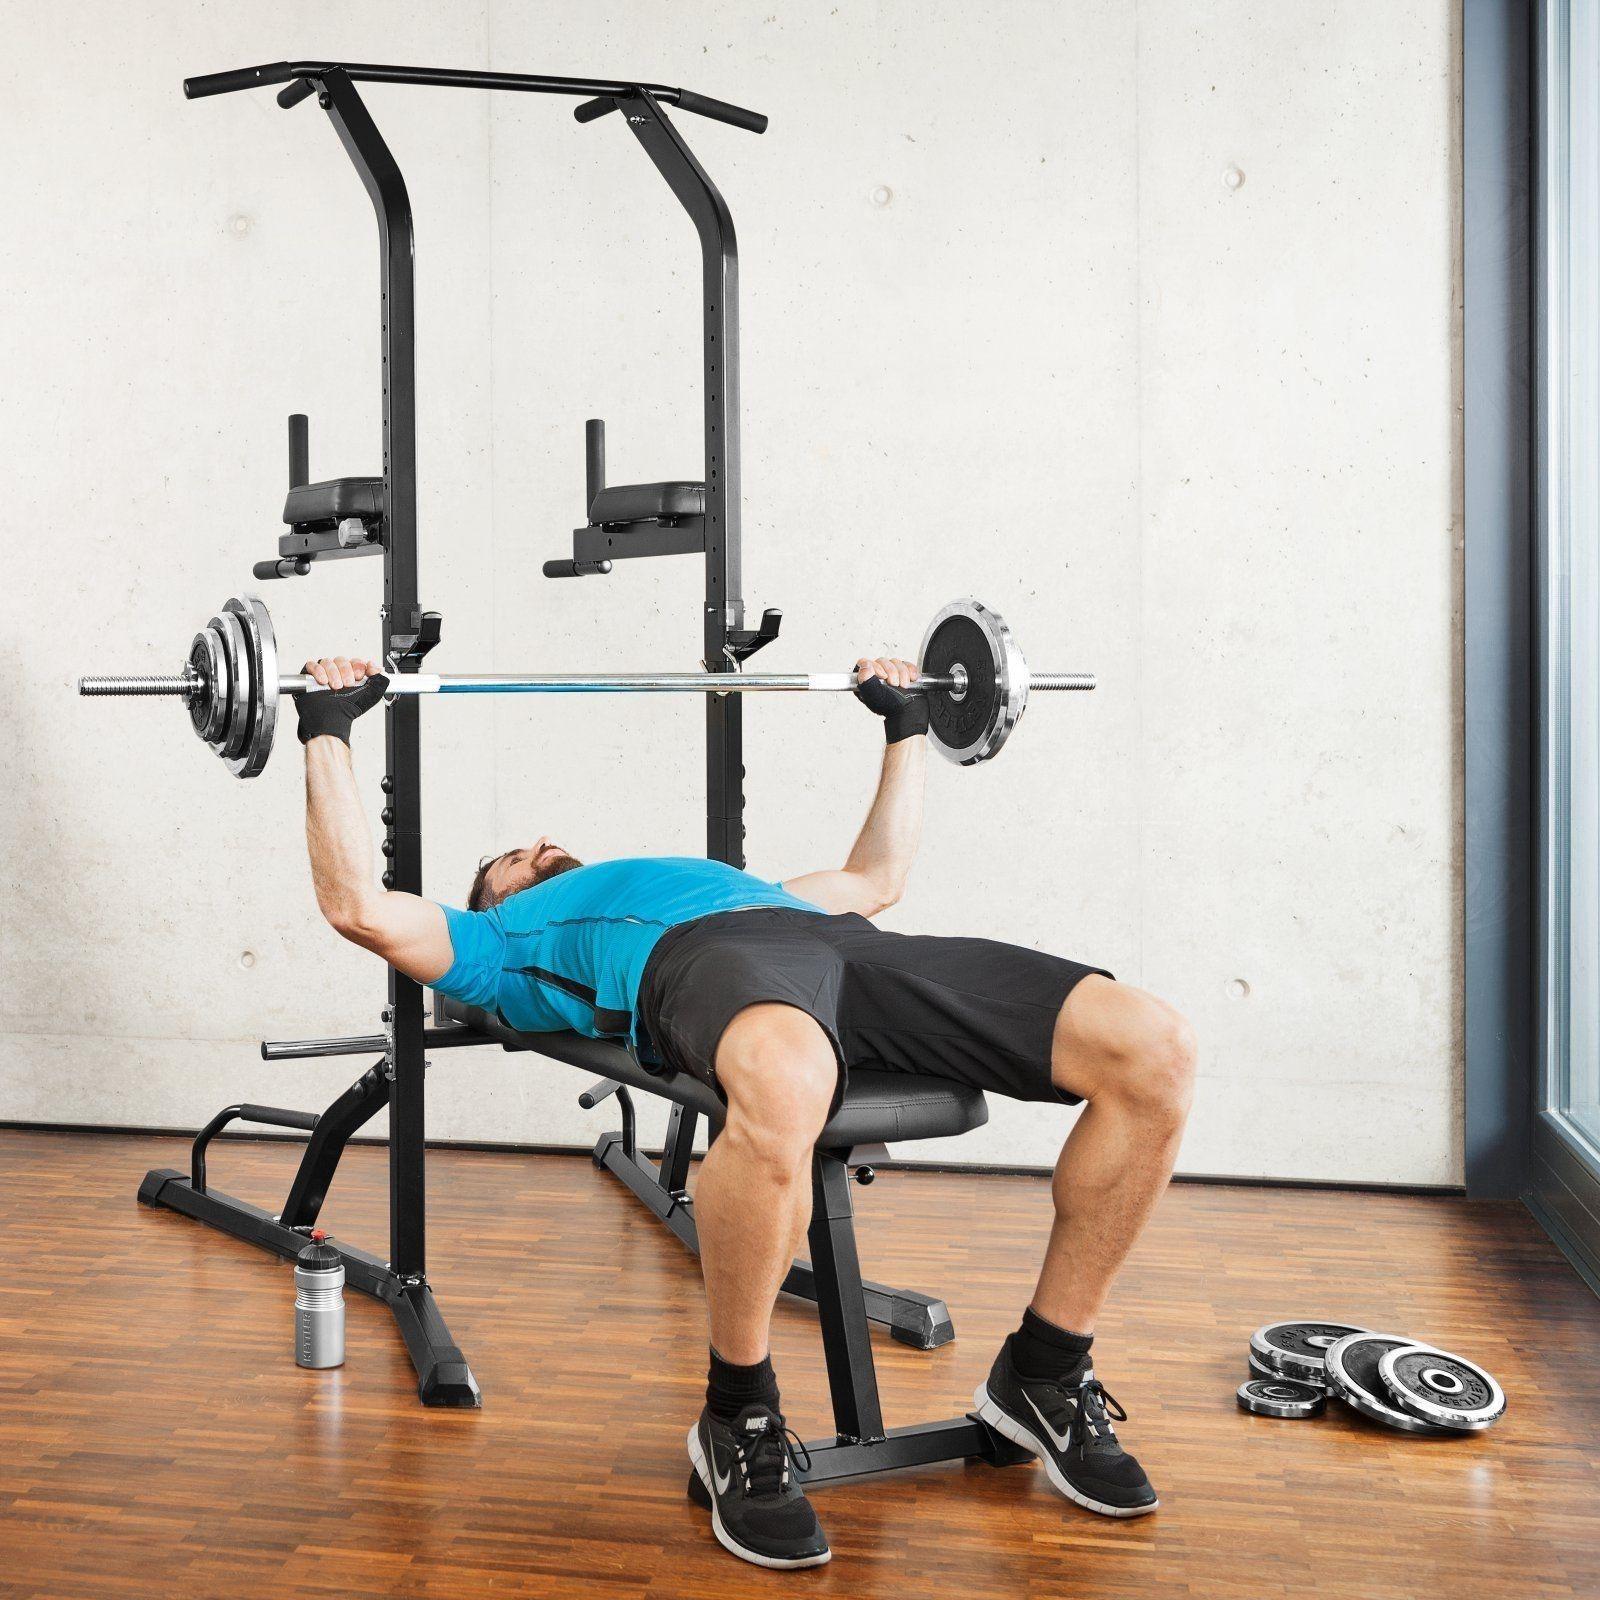 deluxe outdoors com power dp sports fm squat rack amazon press barbell bench cap